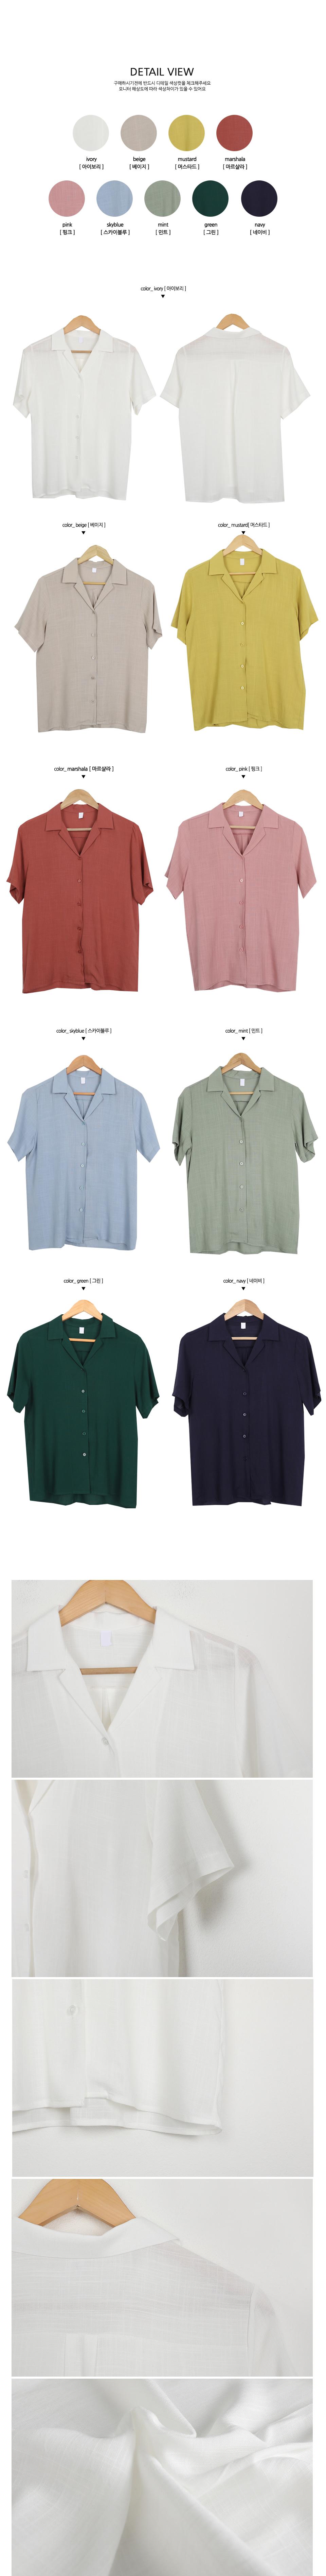 Personal short-sleeved shirt